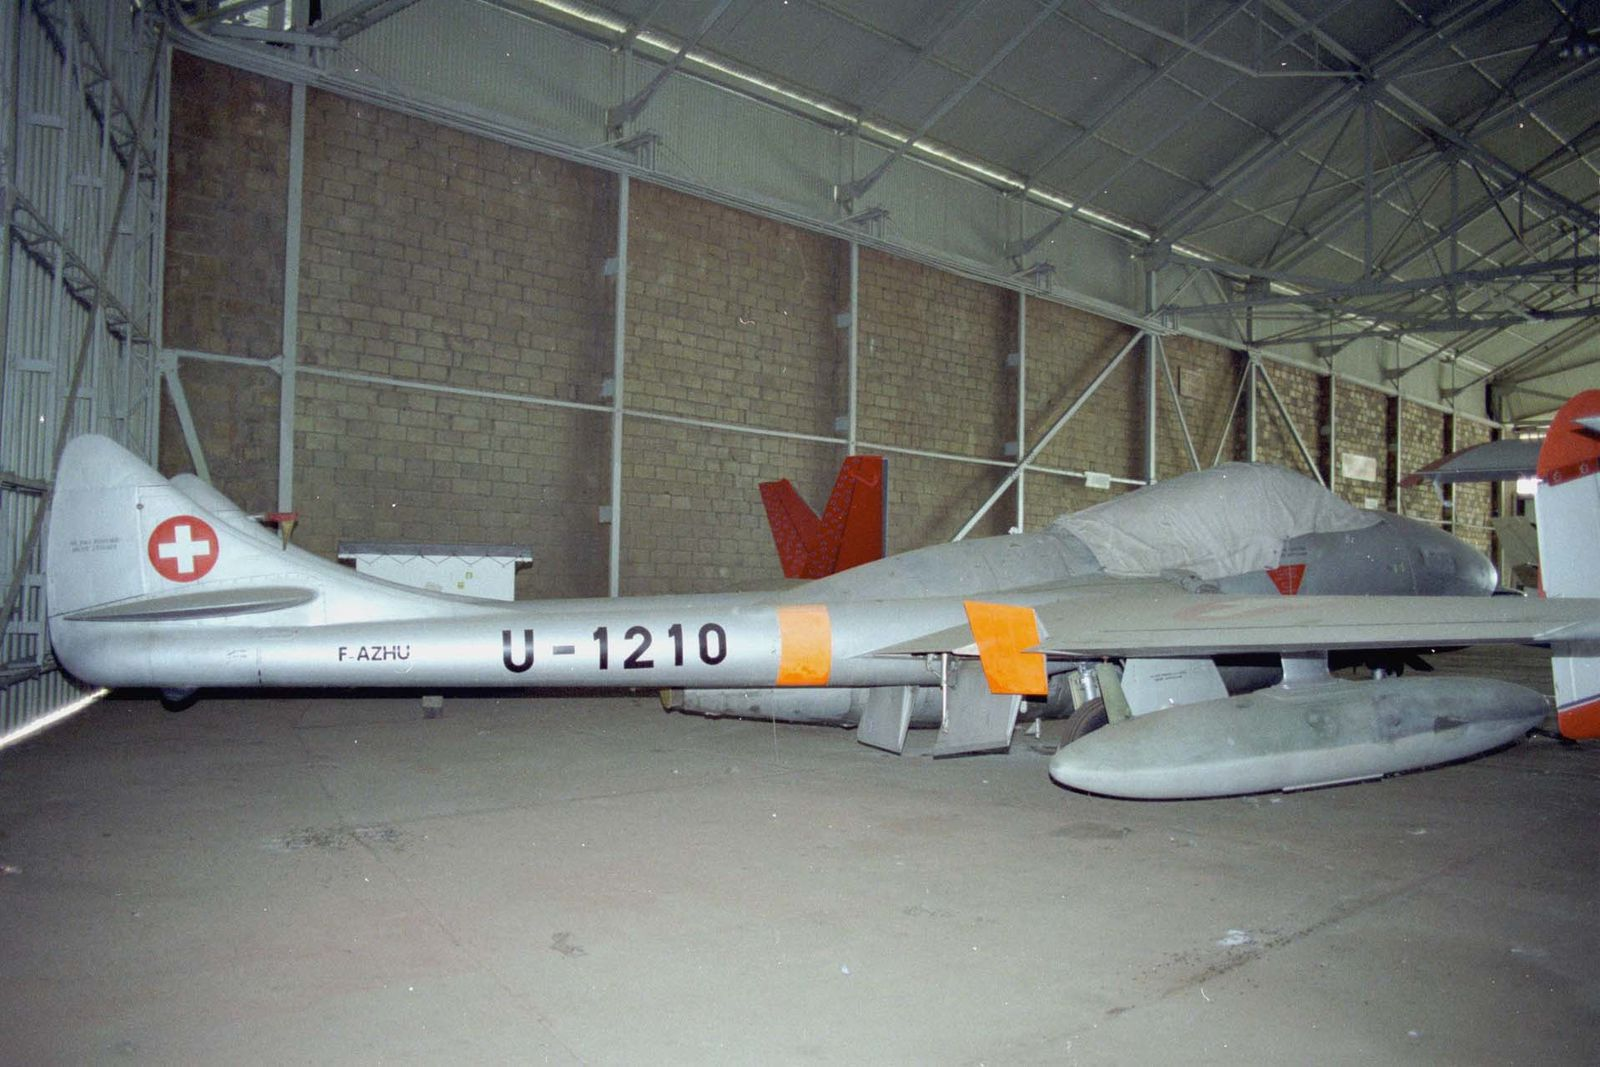 Le DH-115 Vampire T11 F-AZHU